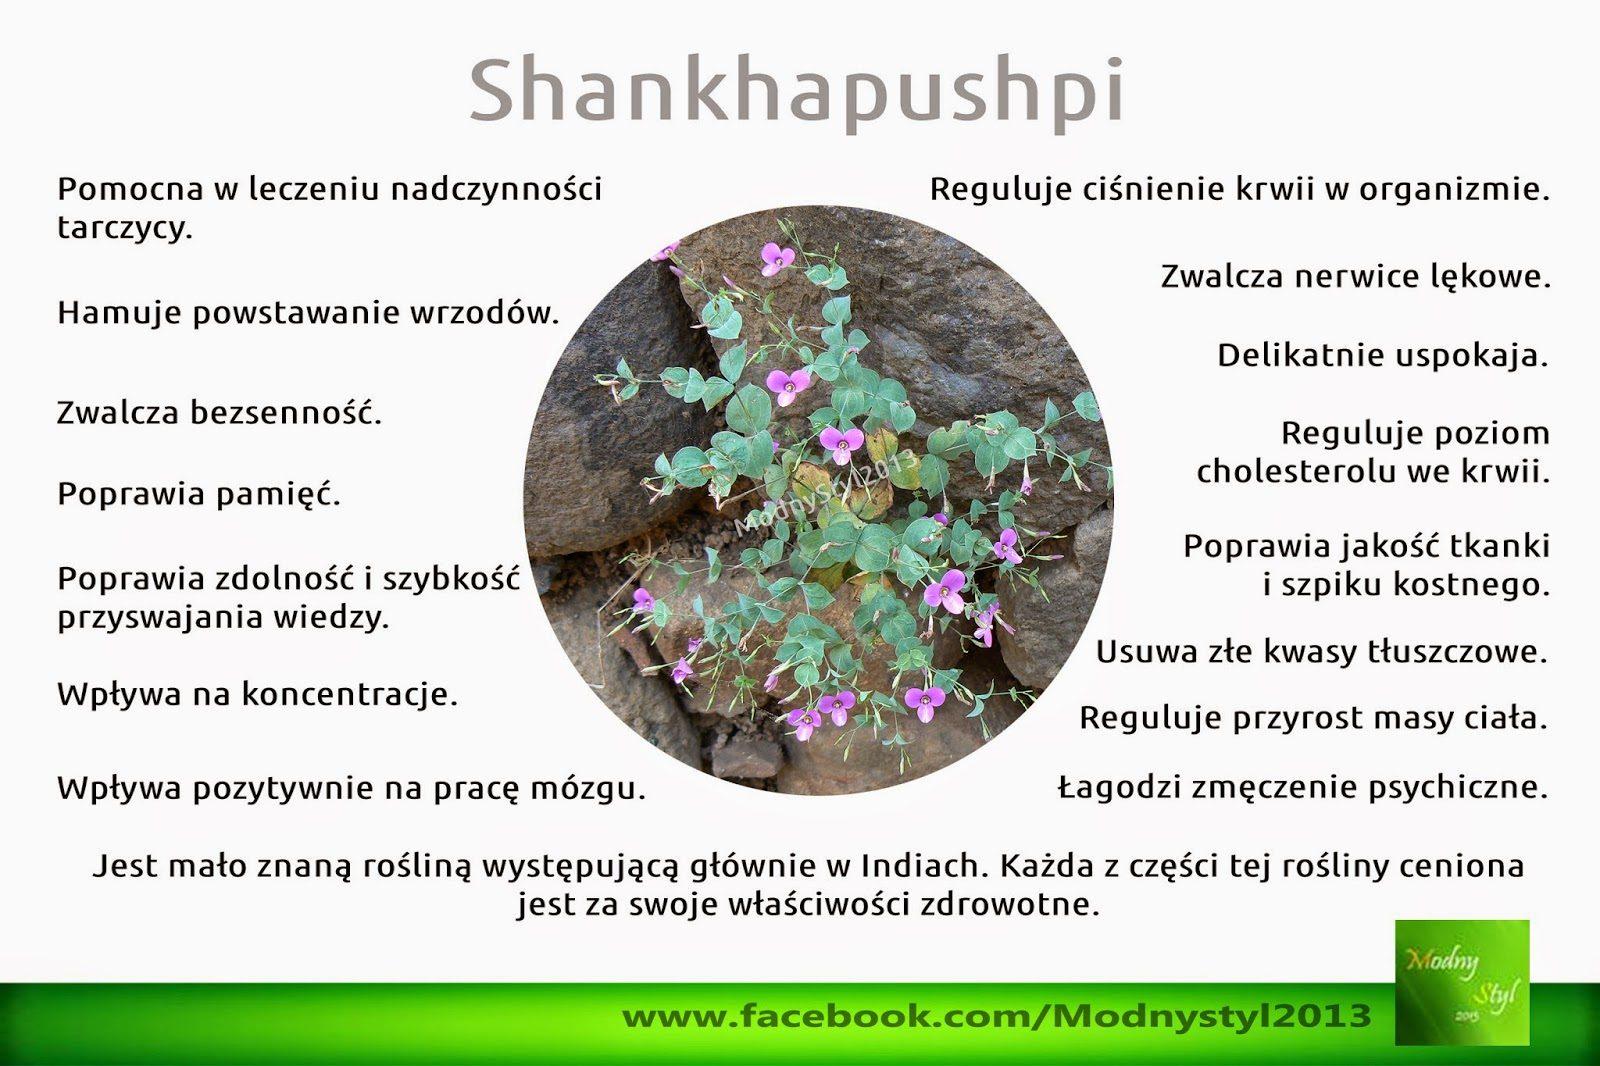 shankhapushpi2b-2bconvolvulus2bpluricaulis-6286954